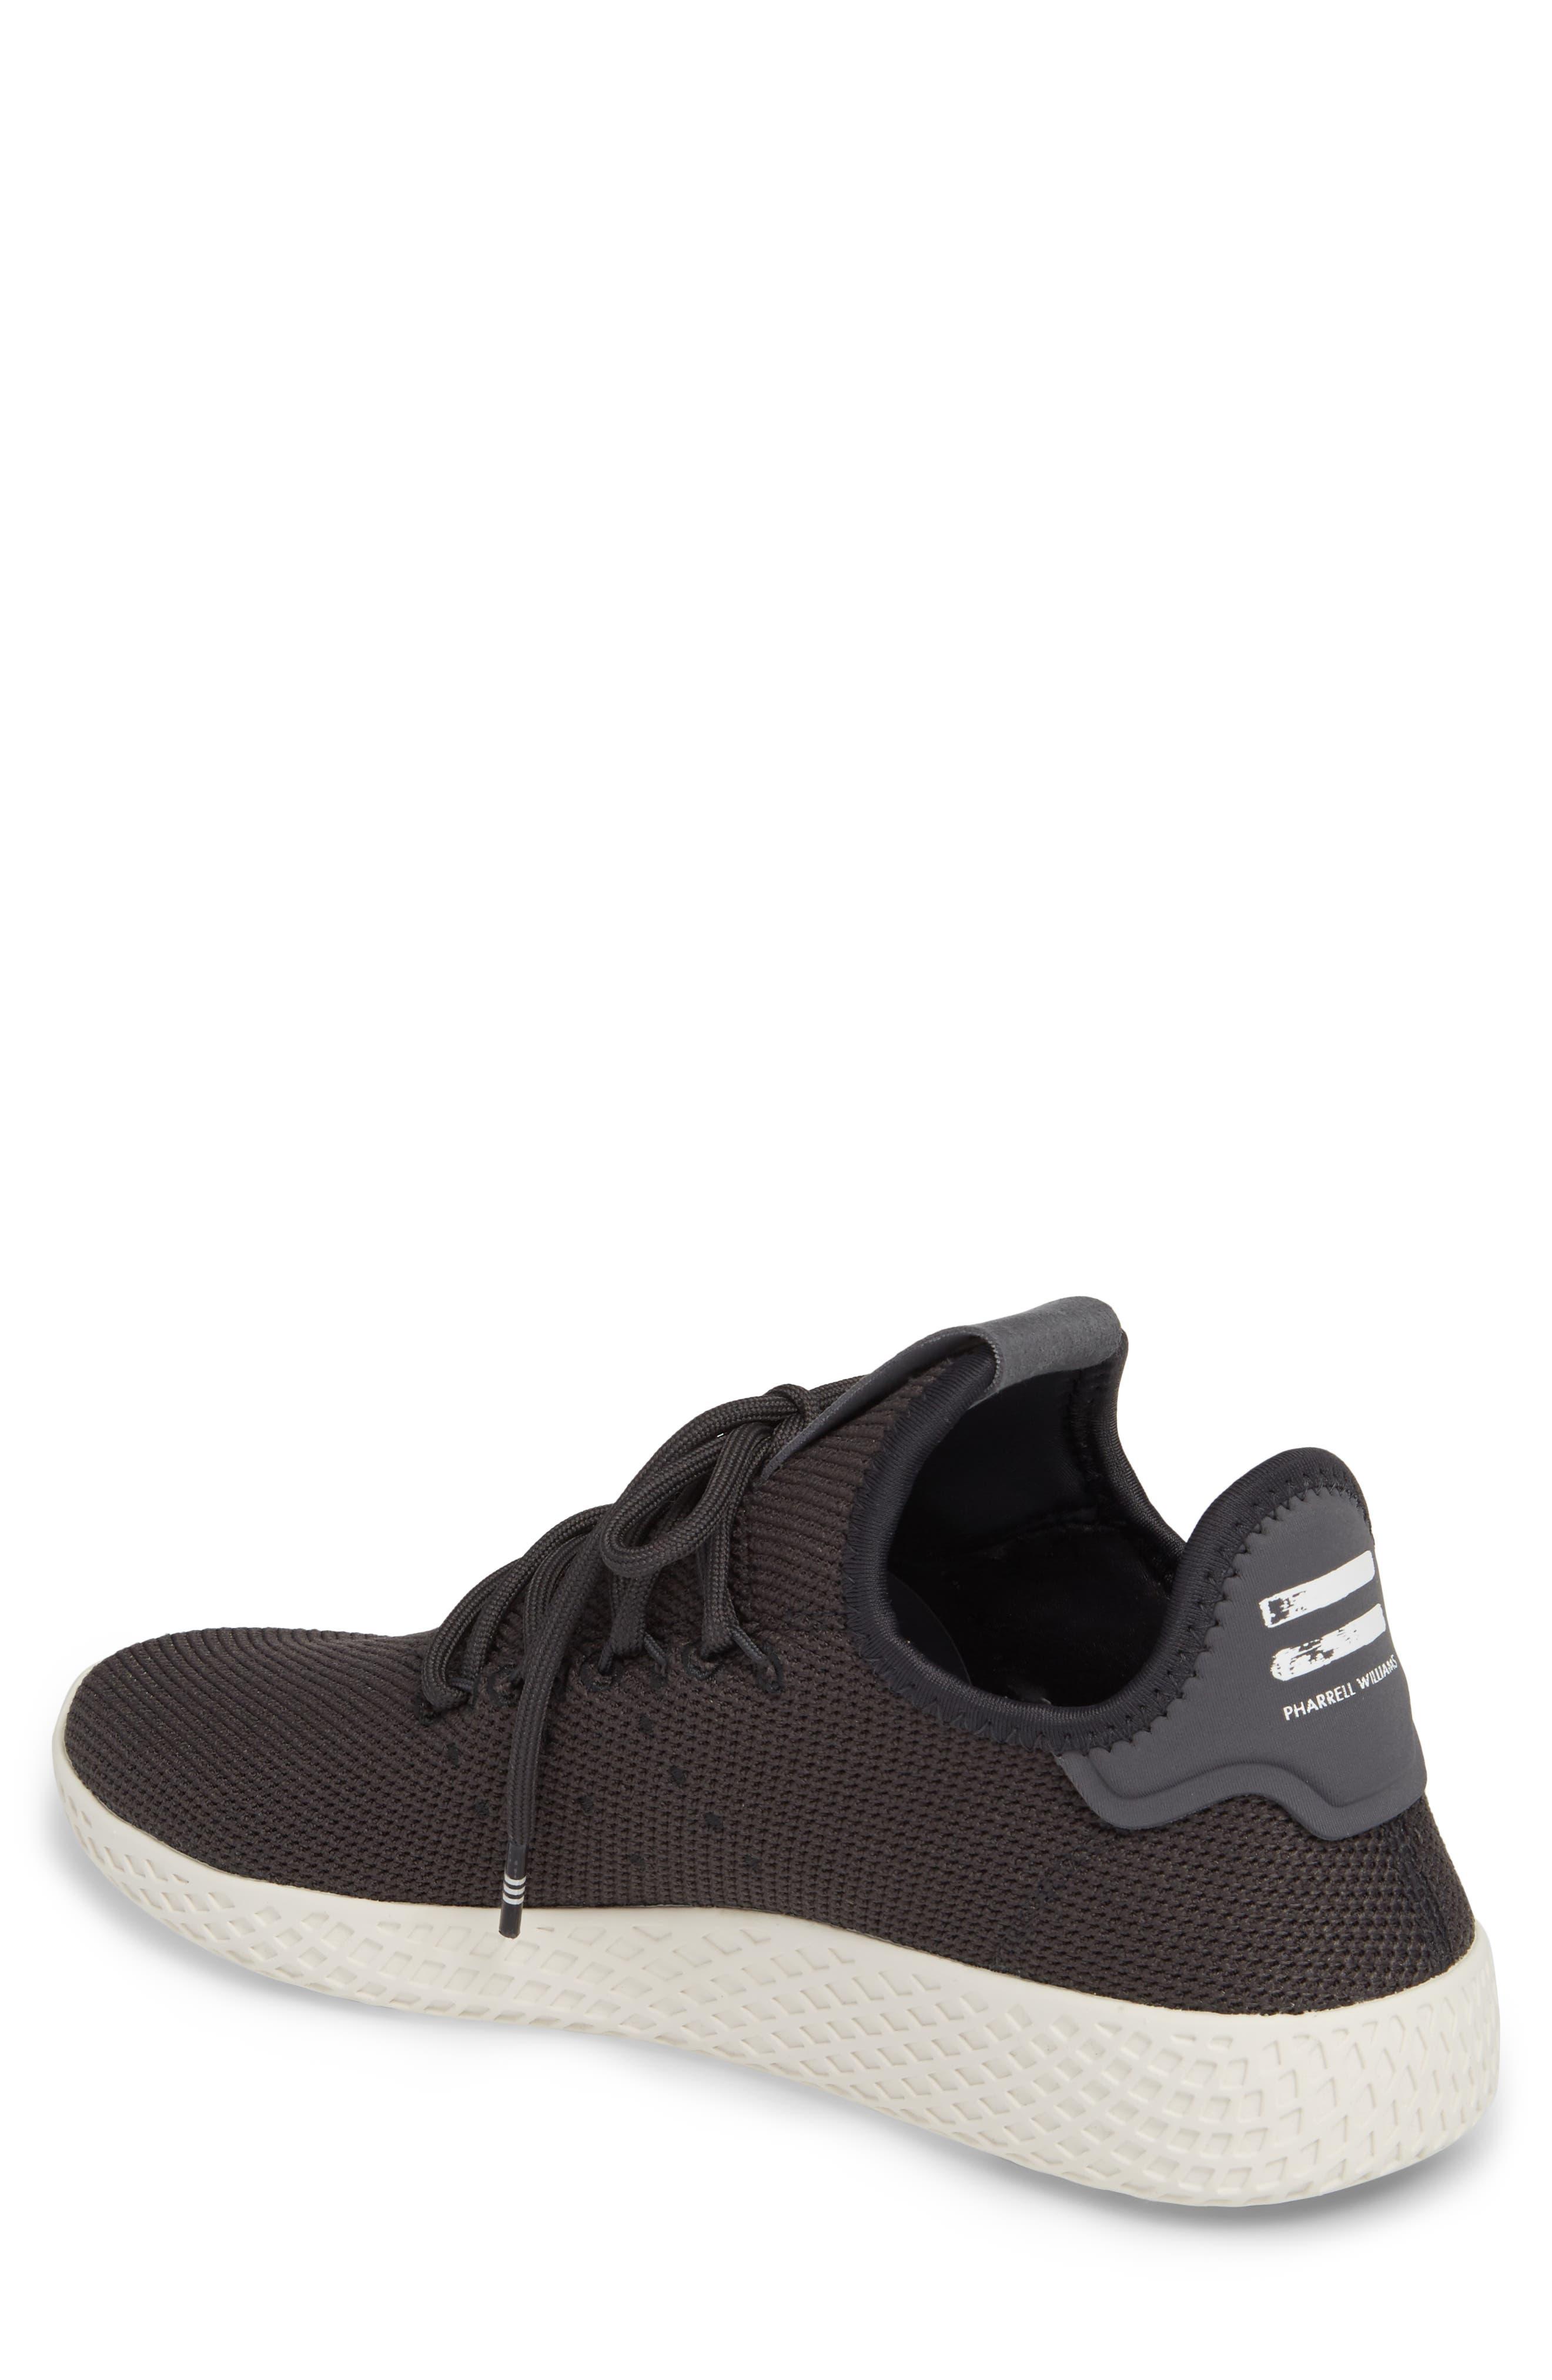 Pharrell Williams Tennis Hu Sneaker,                             Alternate thumbnail 2, color,                             Carbon / Carbon / Chalk White